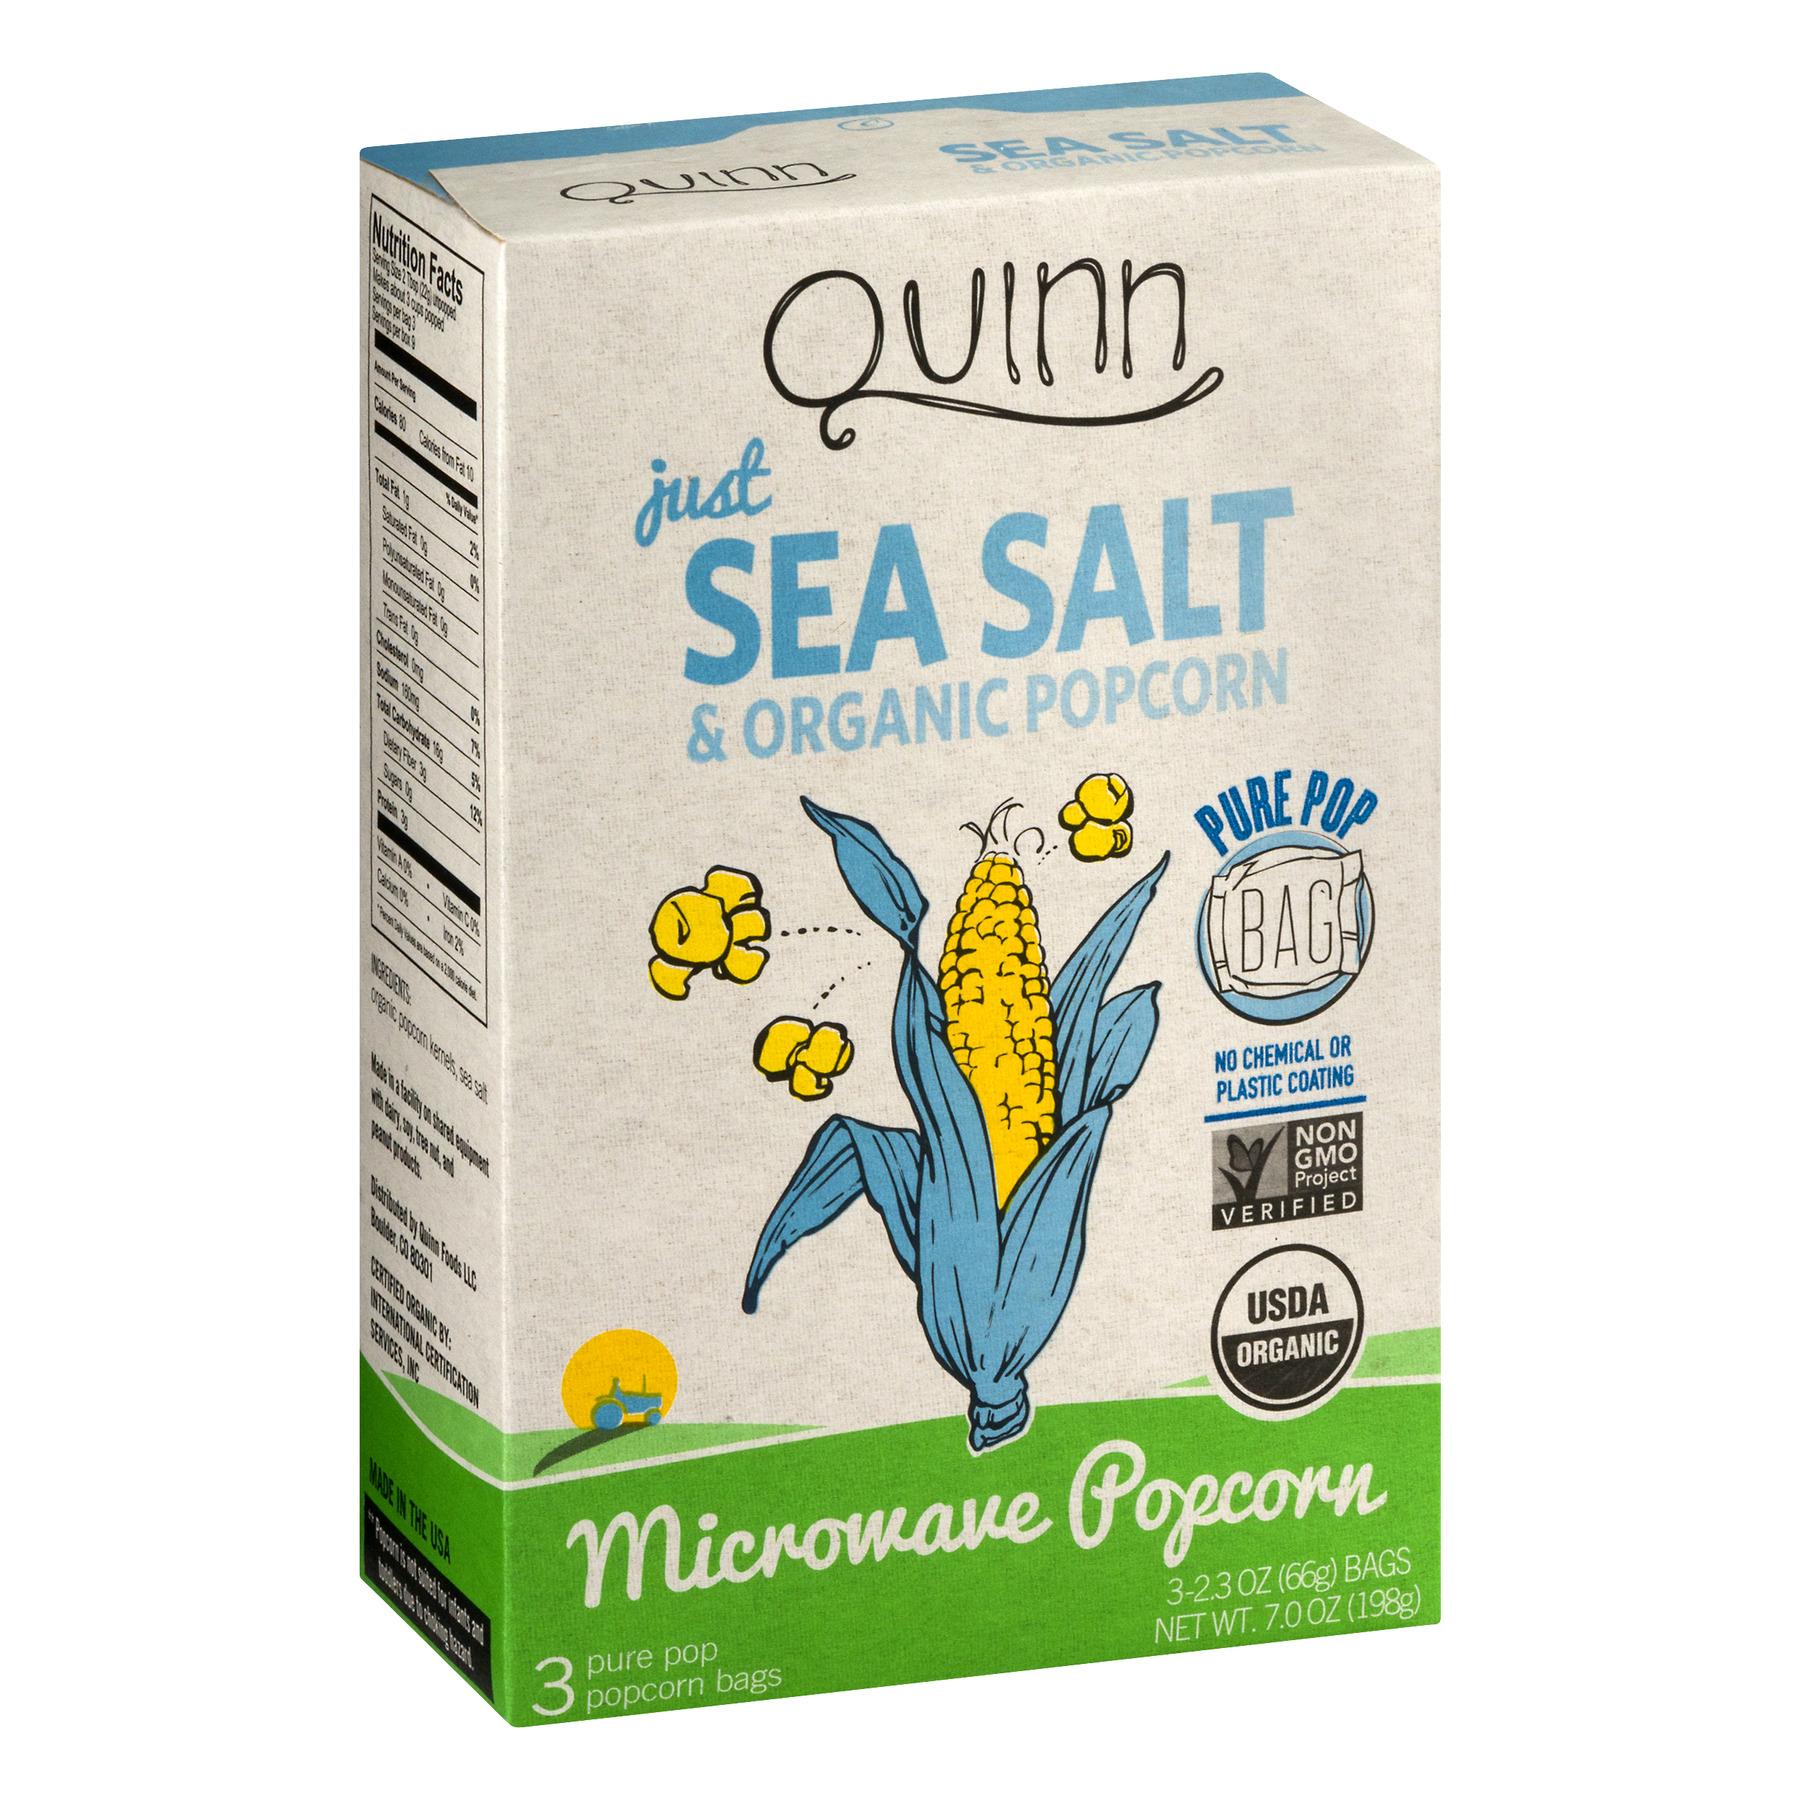 quinn snacks microwave popcorn just sea salt organic popcorn 2 3 oz